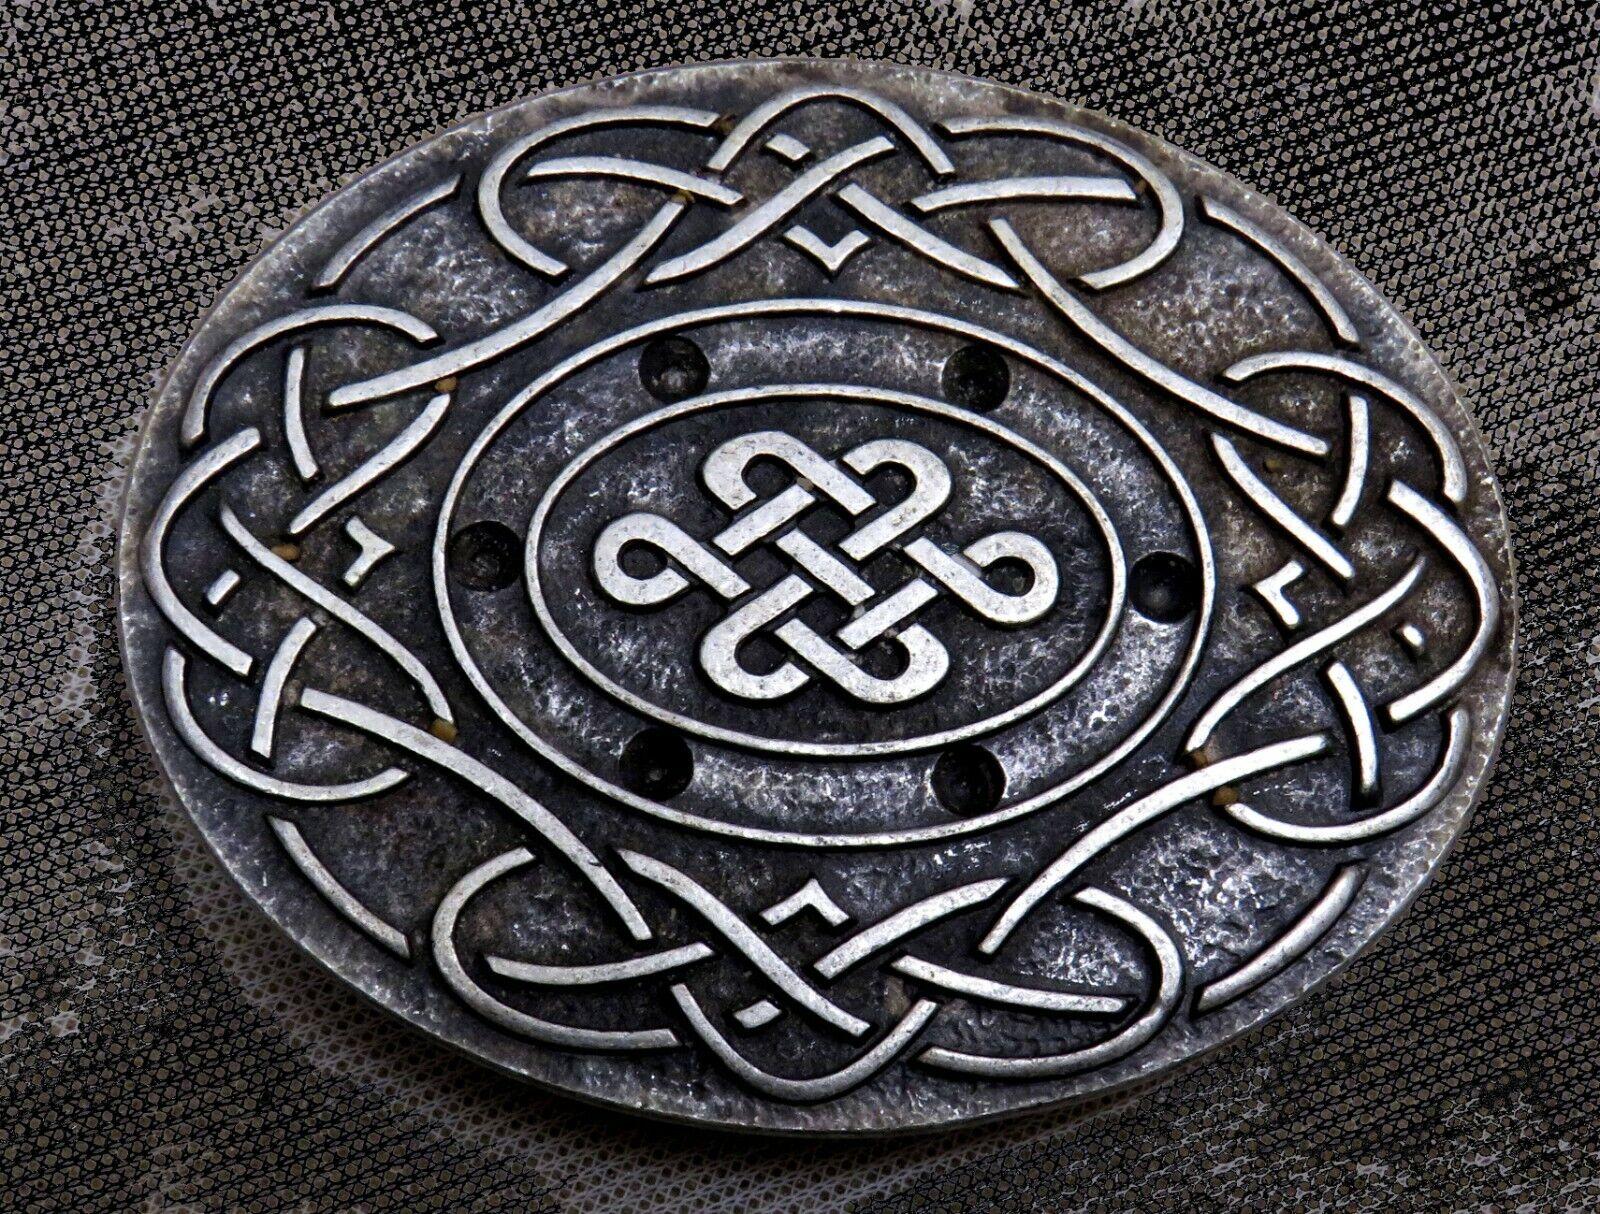 Gürtelschnalle f. 4cm breite GÜRTEL Metall NEU Celtic MITTELALTER Stabil TOP 1A#